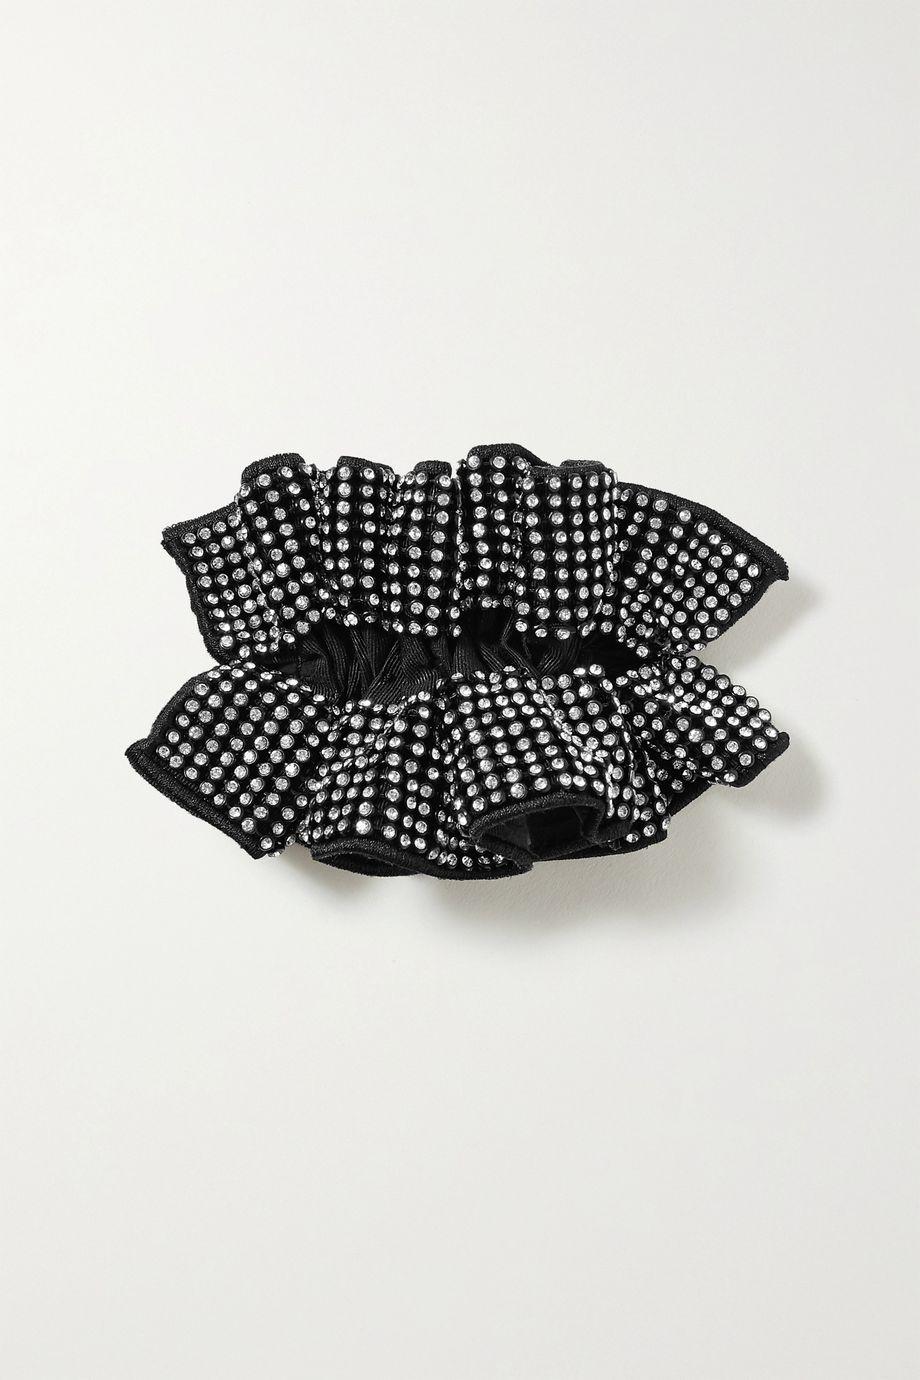 Loeffler Randall Luna ruffled crystal-embellished grosgrain hair clip